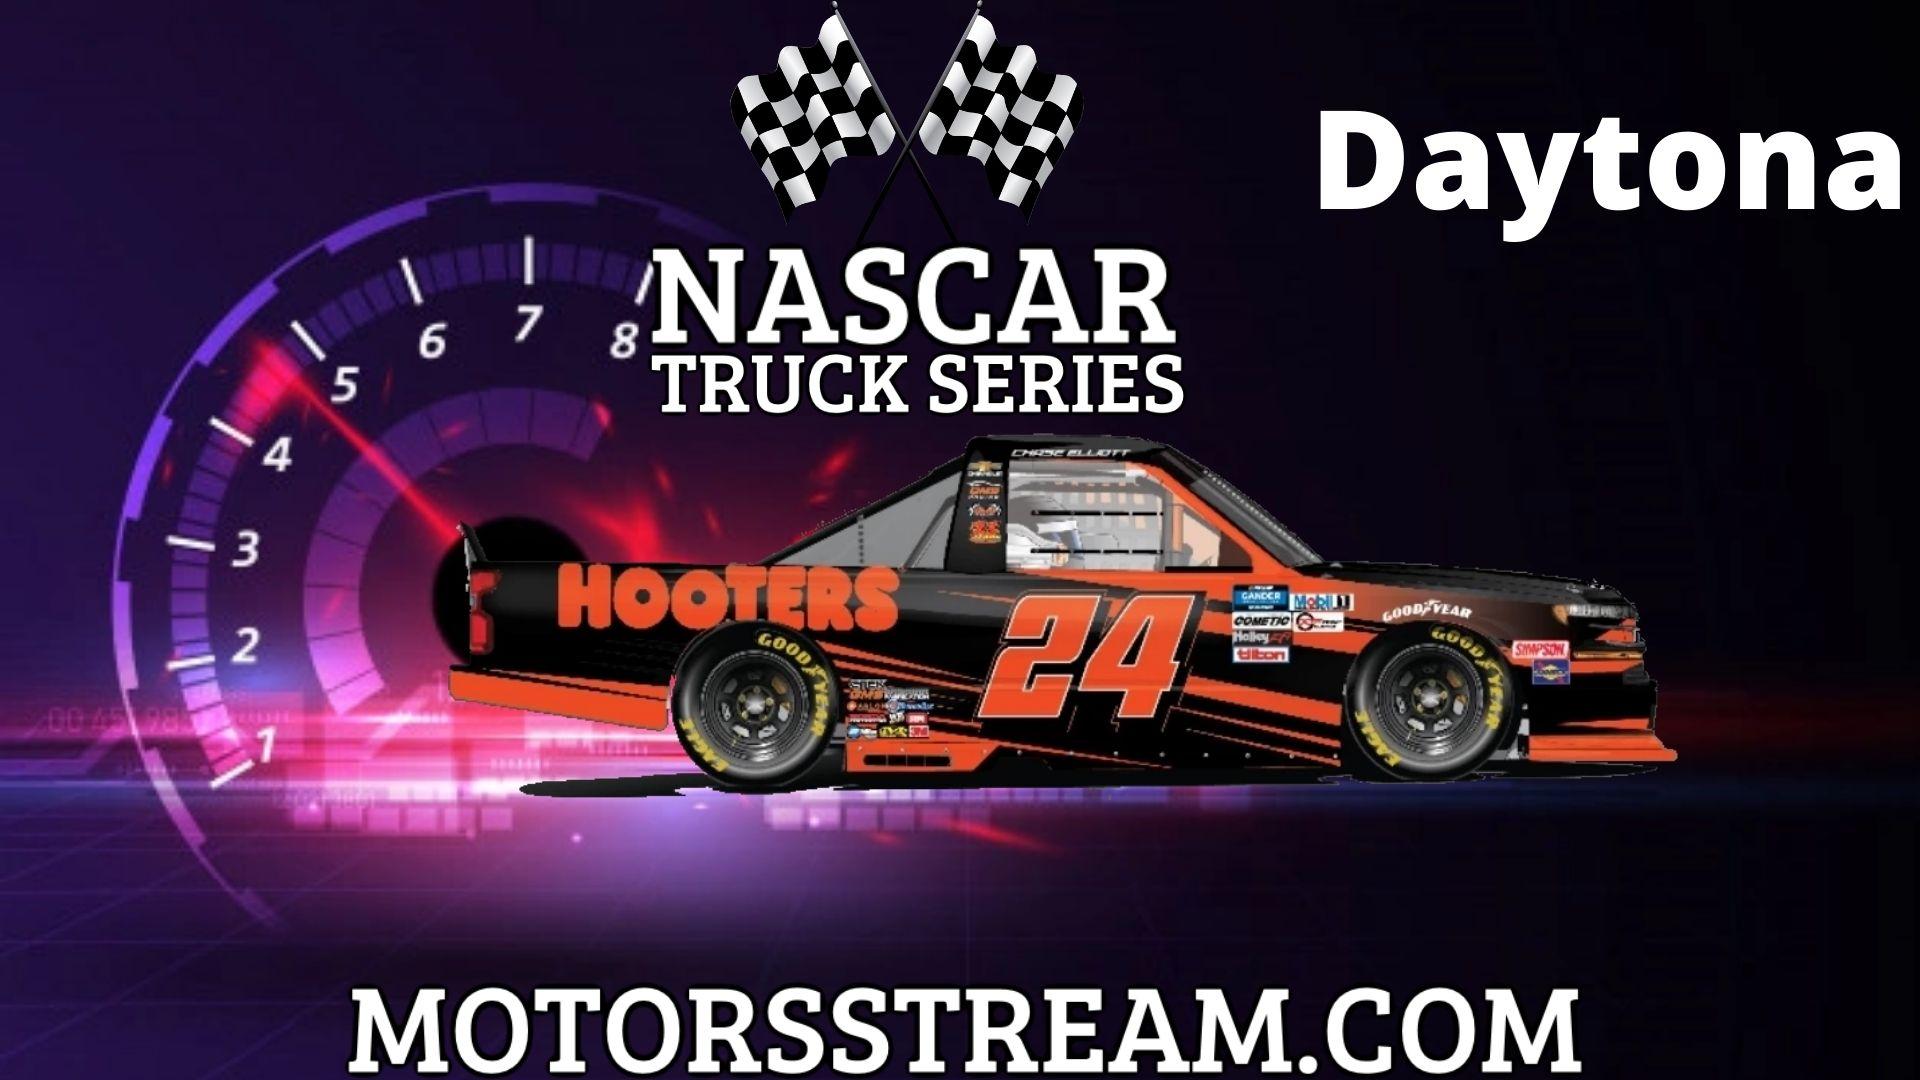 NASCAR Camping World Truck Series Daytona RC Live Stream